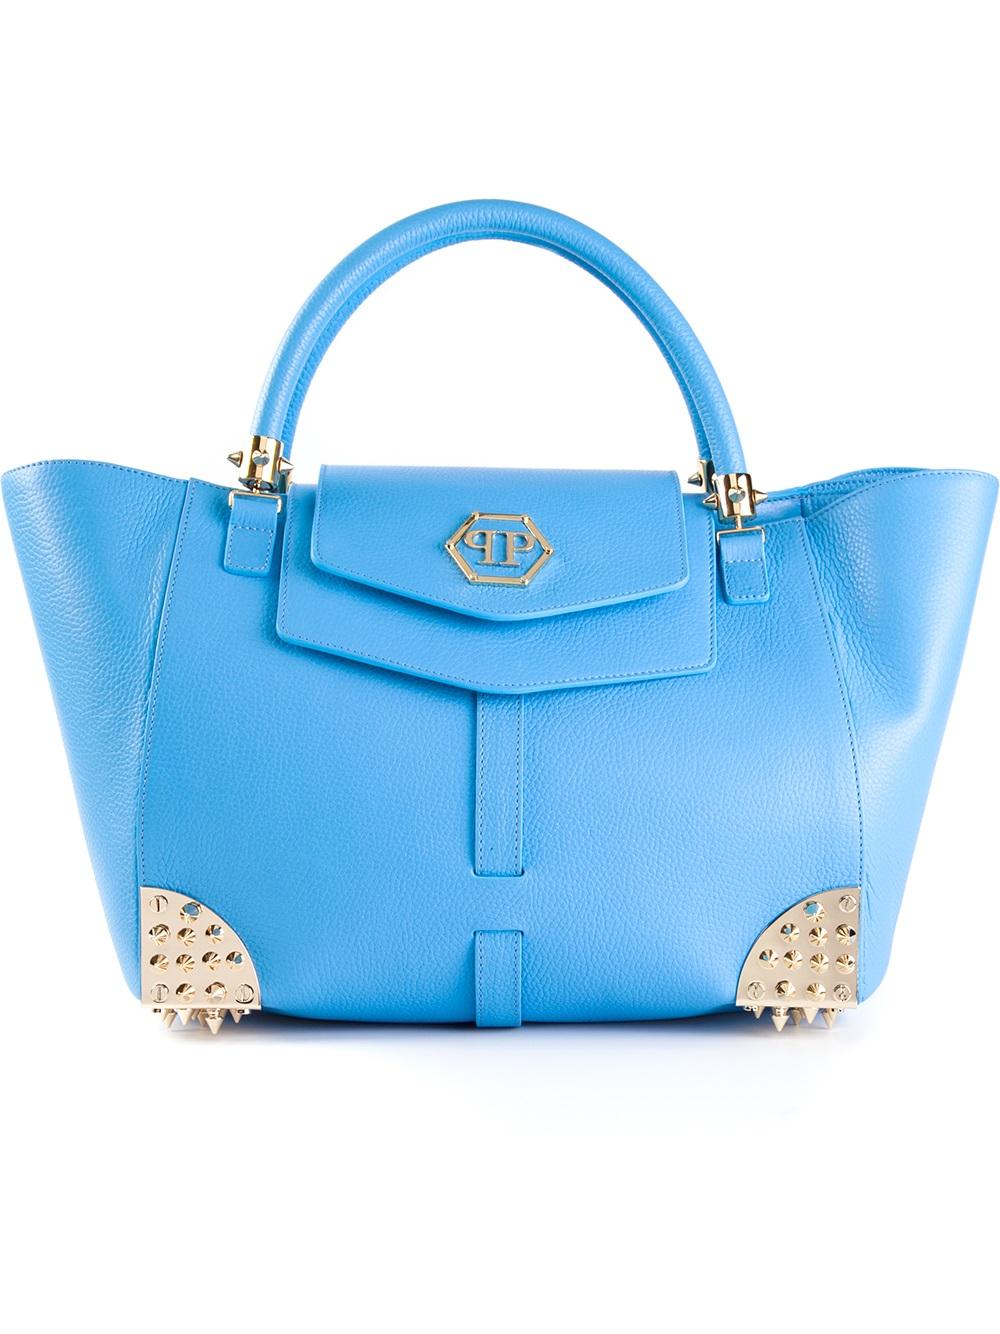 Extra Large Tote Long Champ Longchamp Le Pliage Neo Small Handbag 1512578545 Red